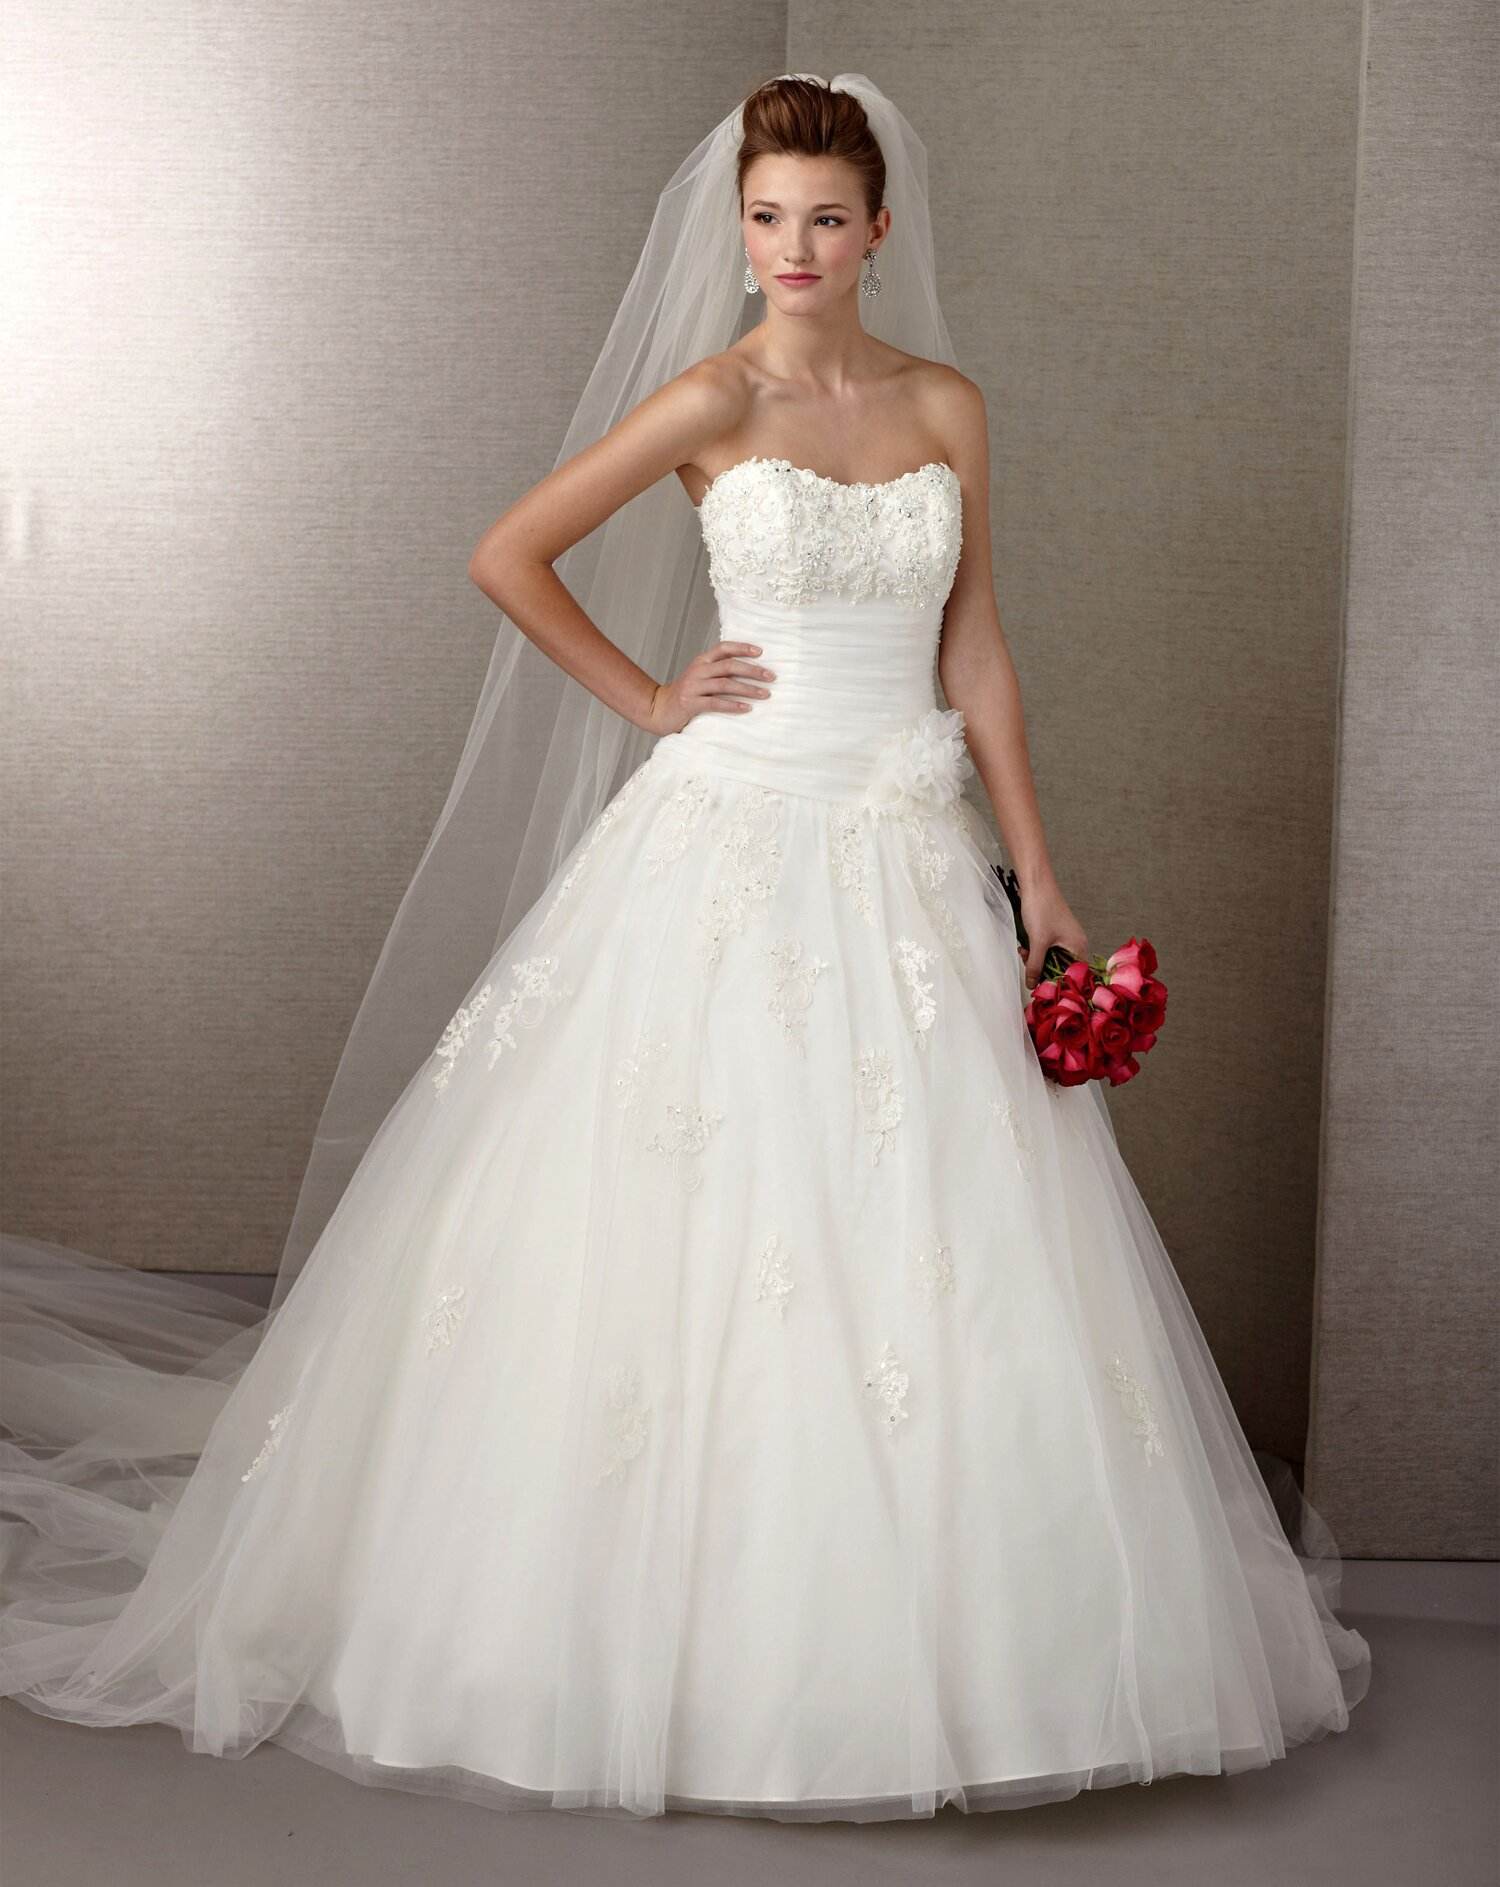 Bridesmaid Dresses Michigan